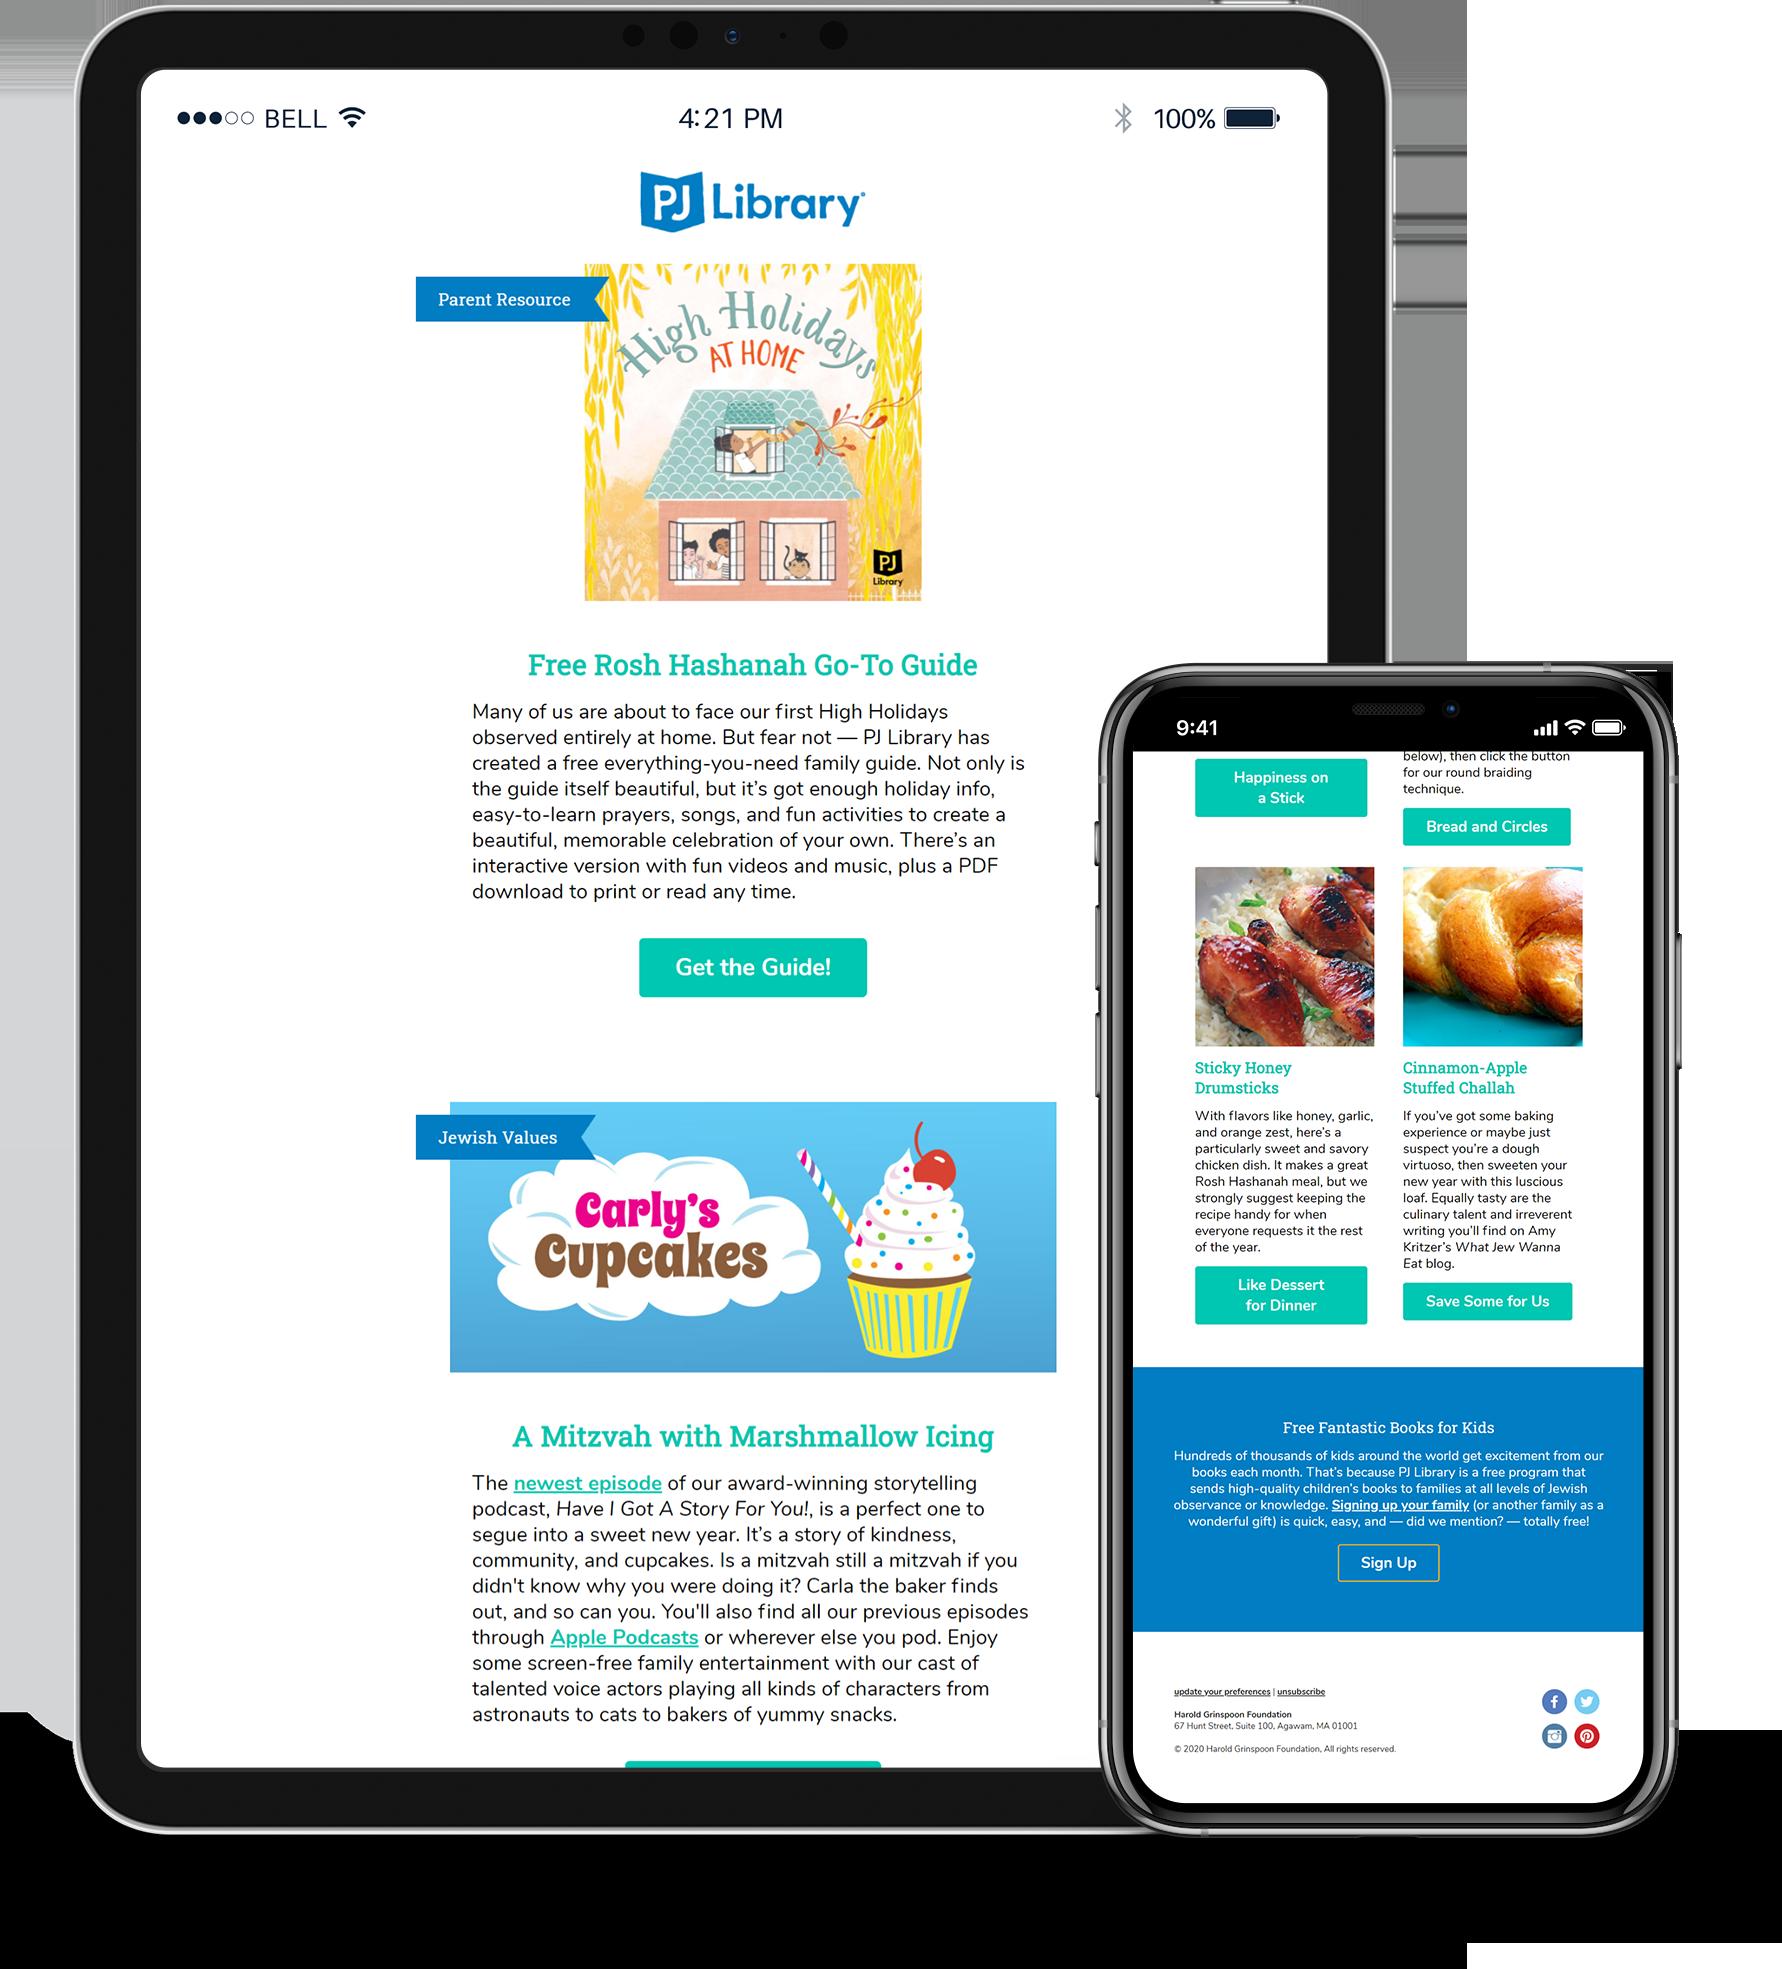 PJ Library Lead Generation Newsletter